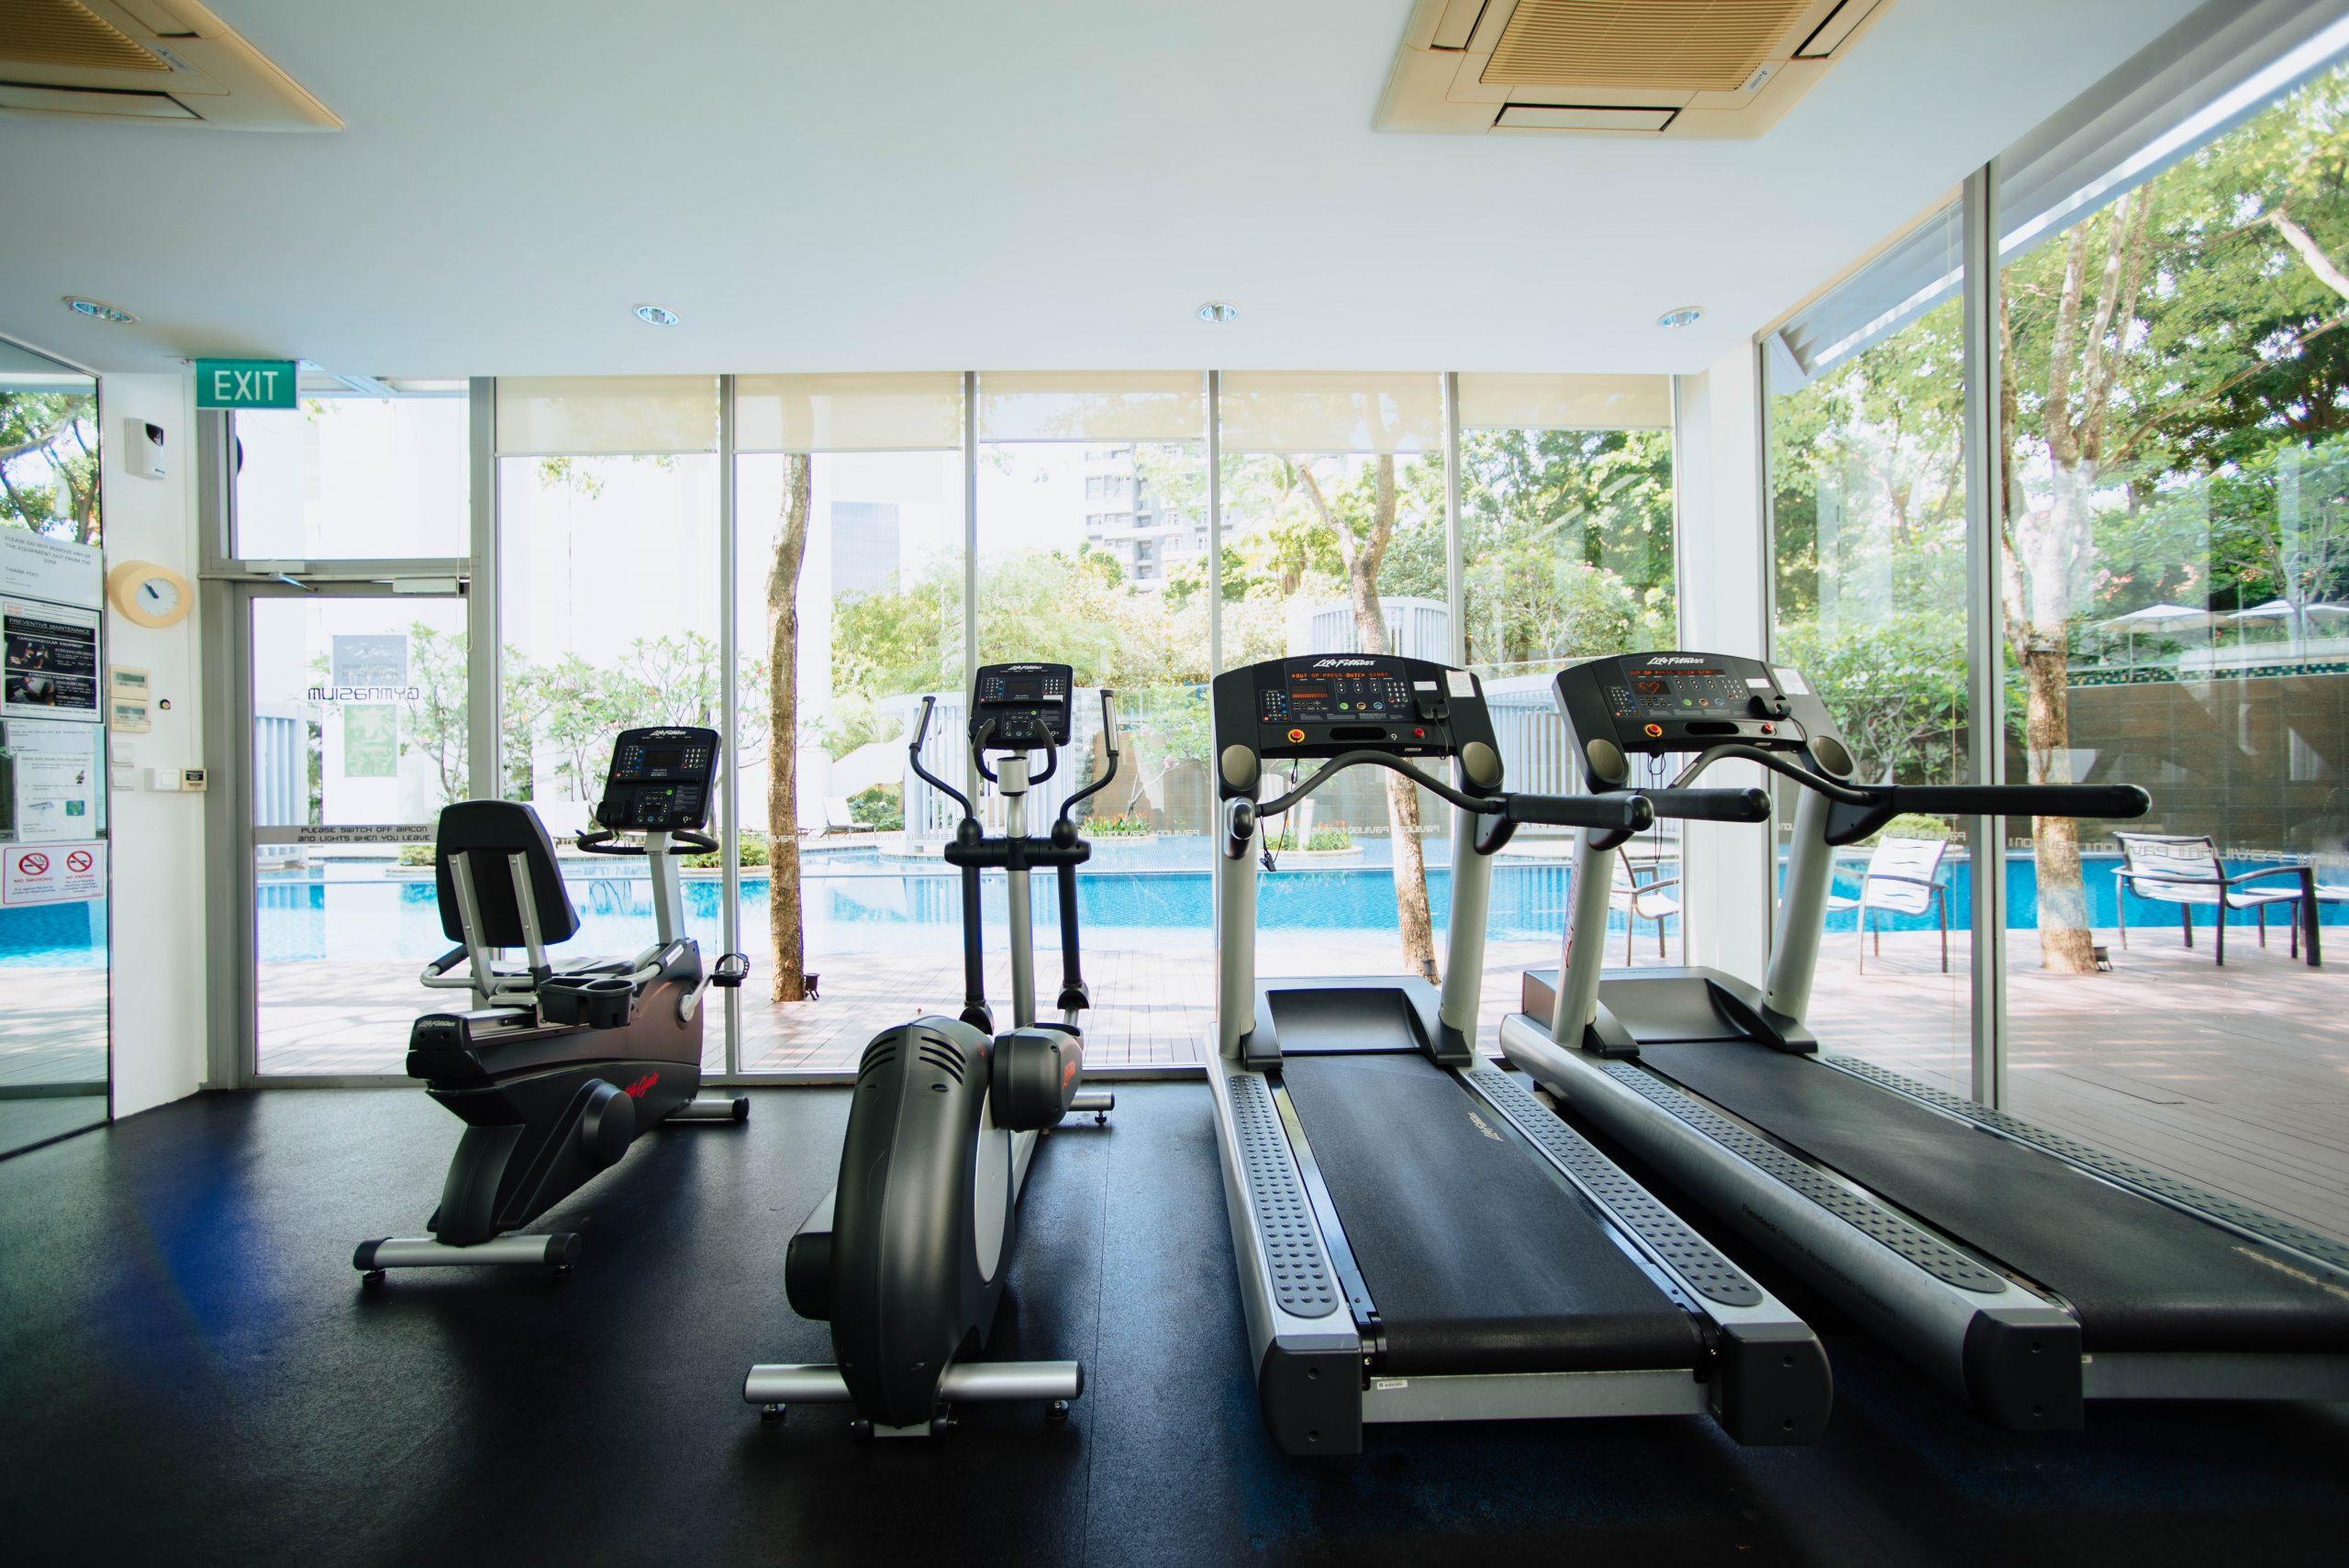 Treadmill or Elliptical Machine